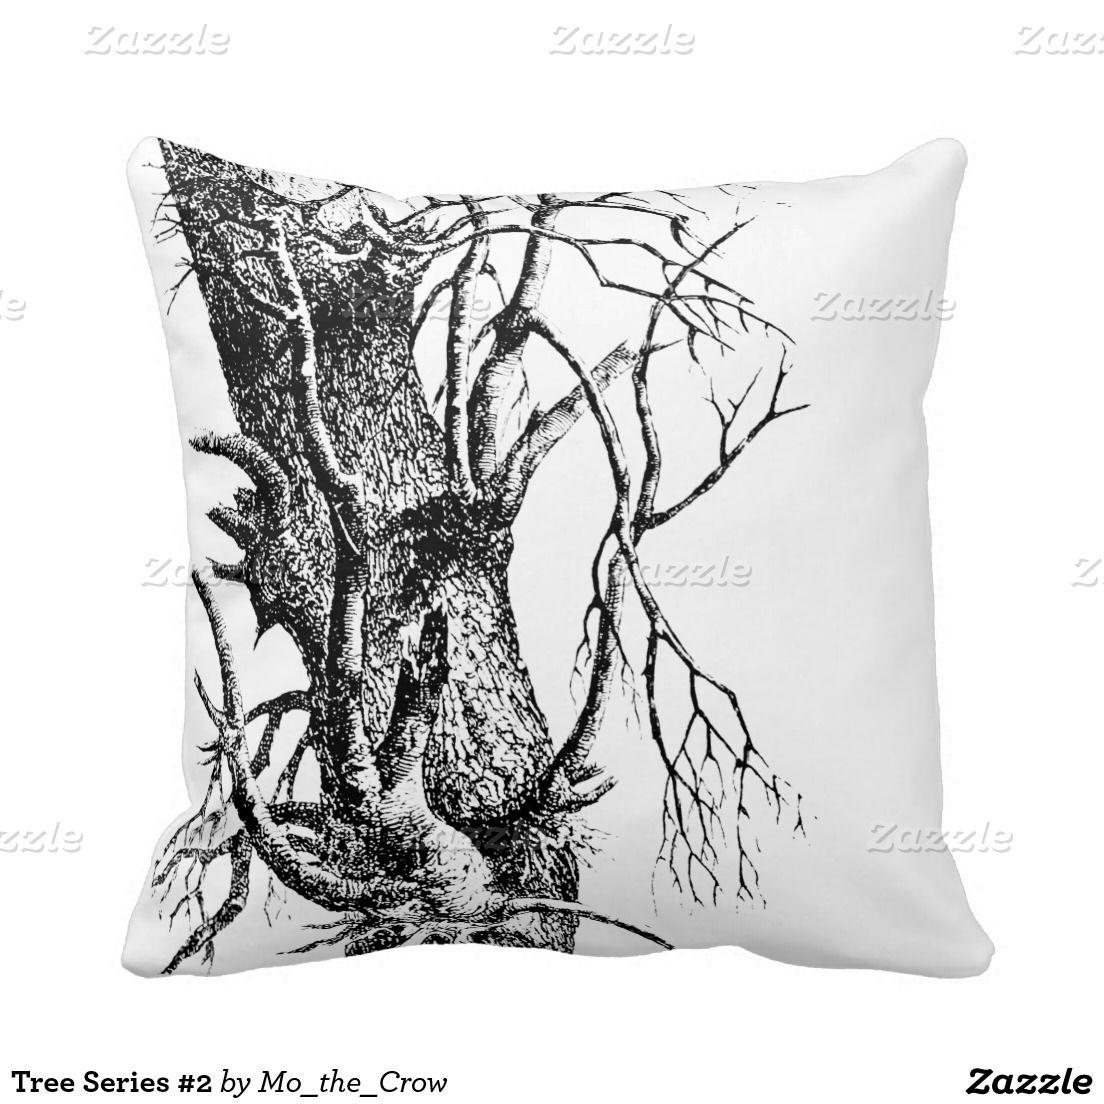 Tree Series #2 Pillows